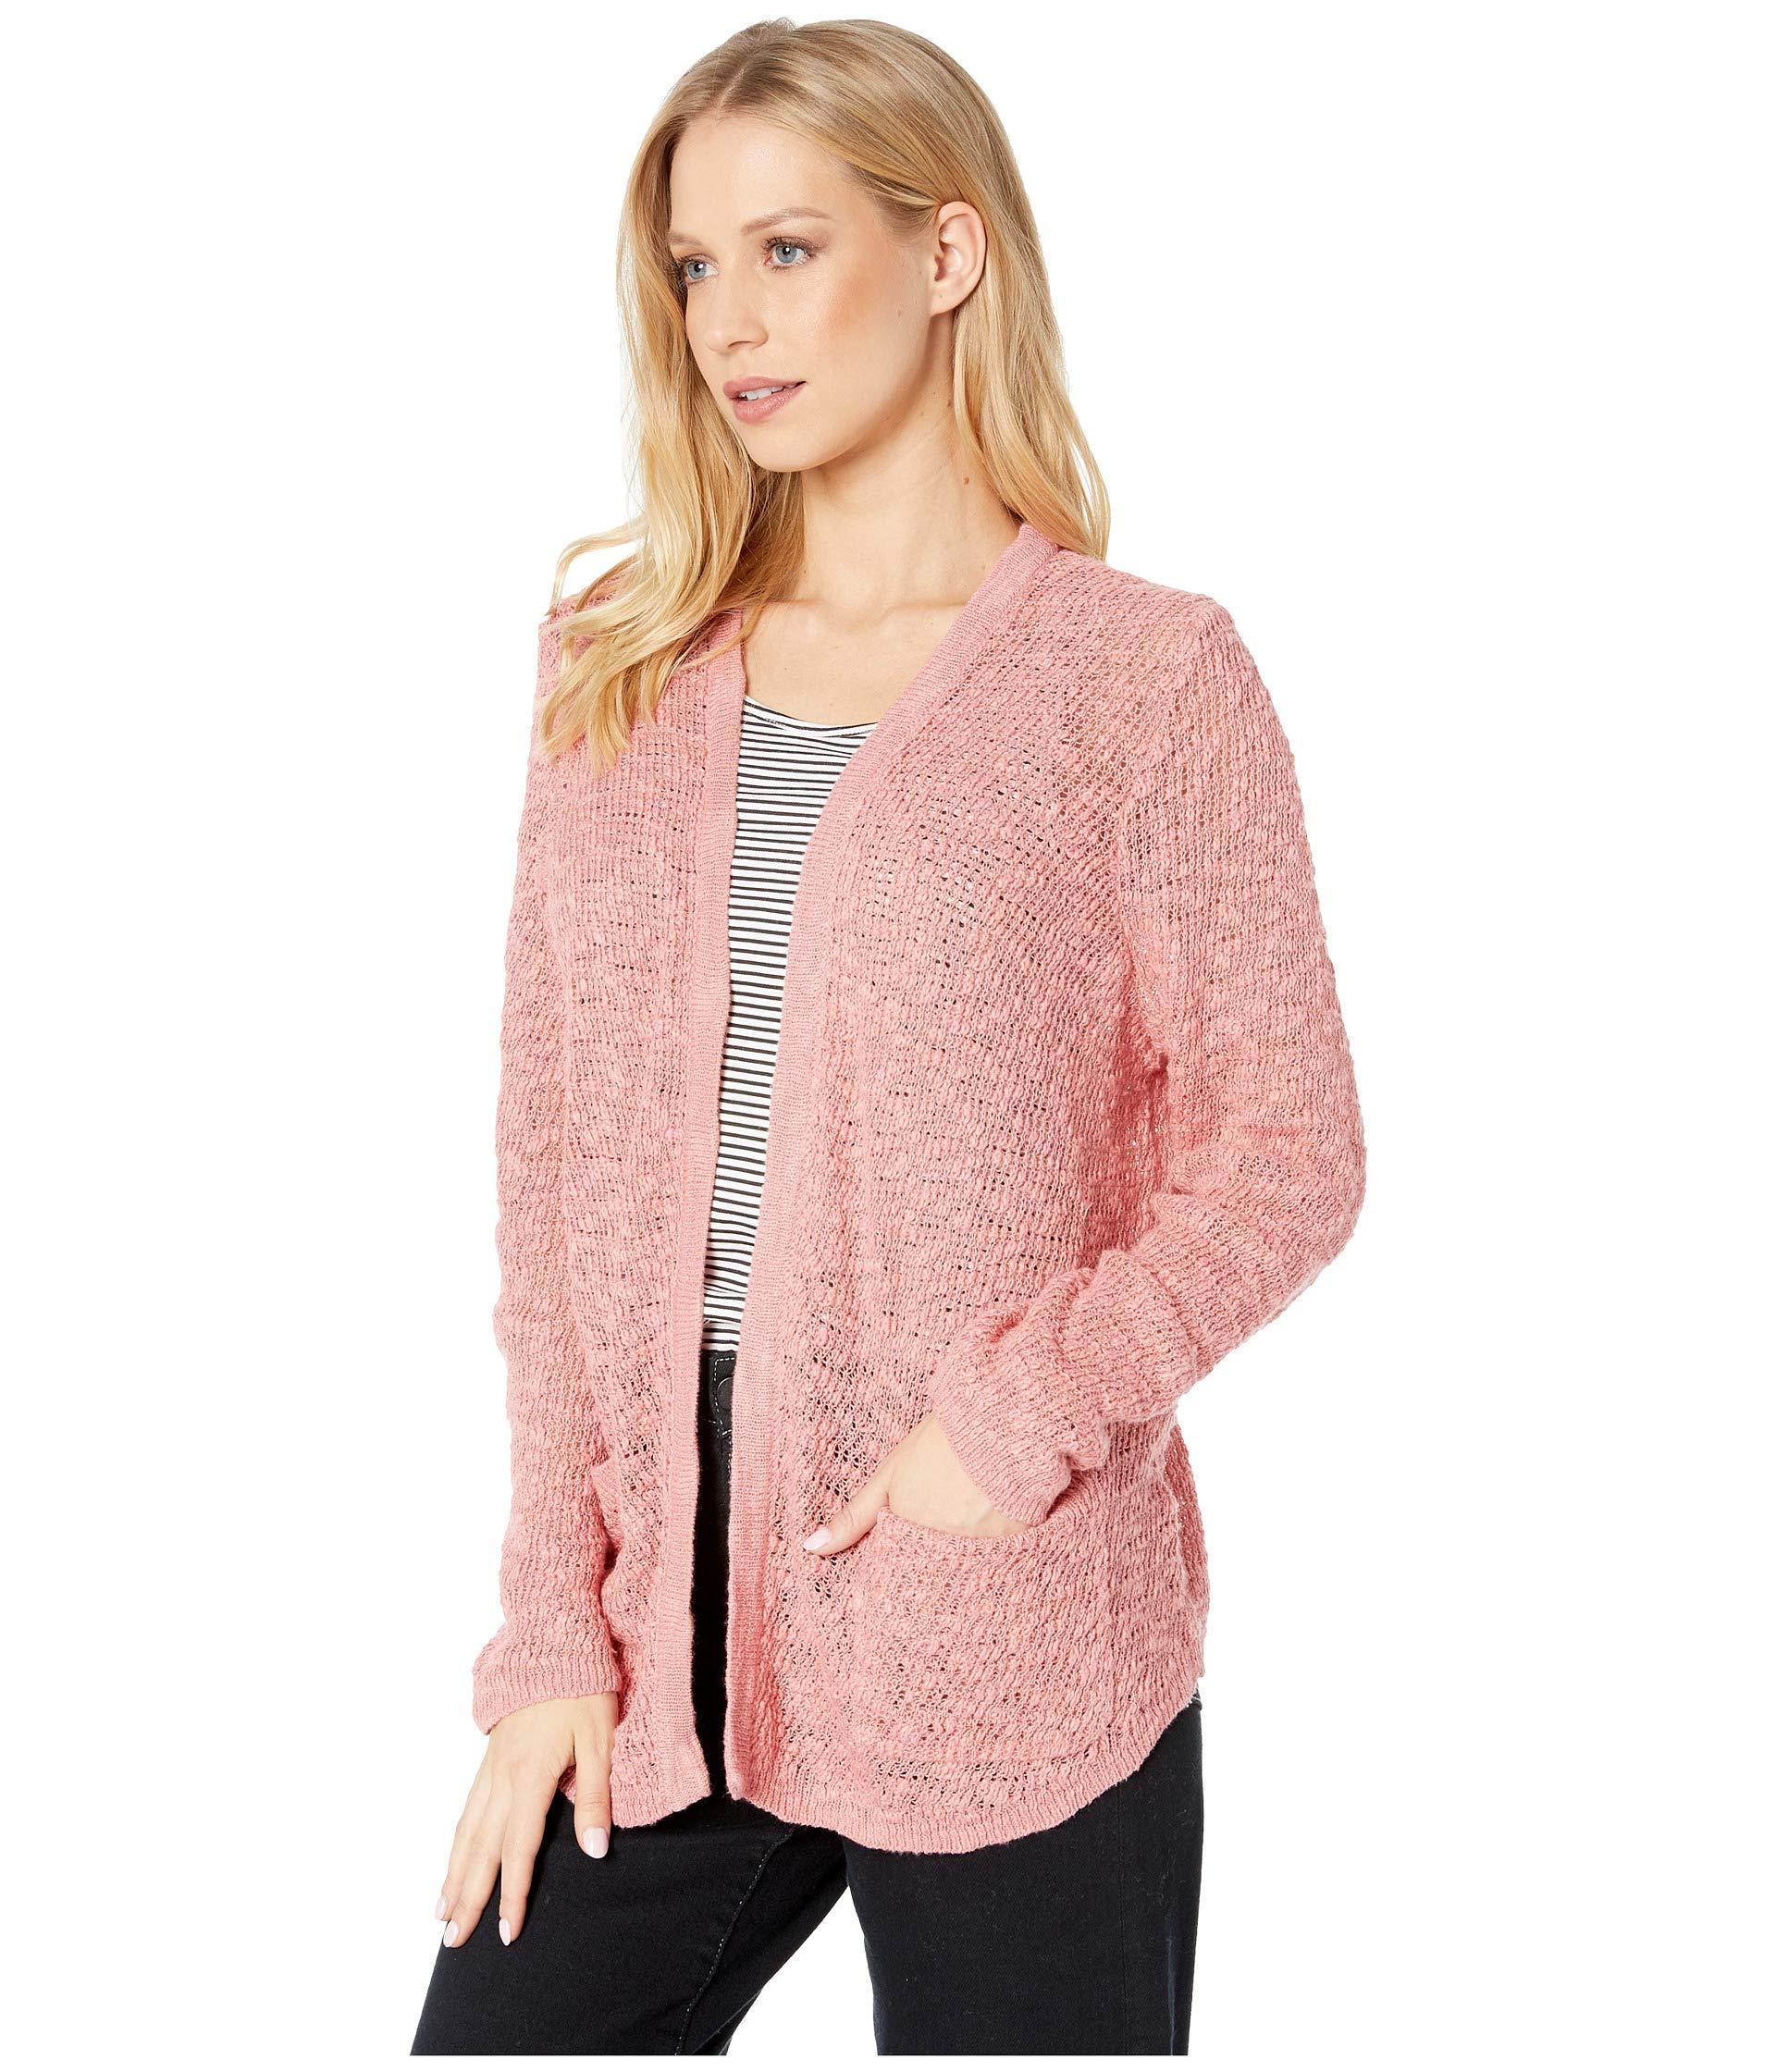 5df203ed78 ... Liberty Discover Cardigan (marshmallow) Women s Sweater - Lyst. View  fullscreen